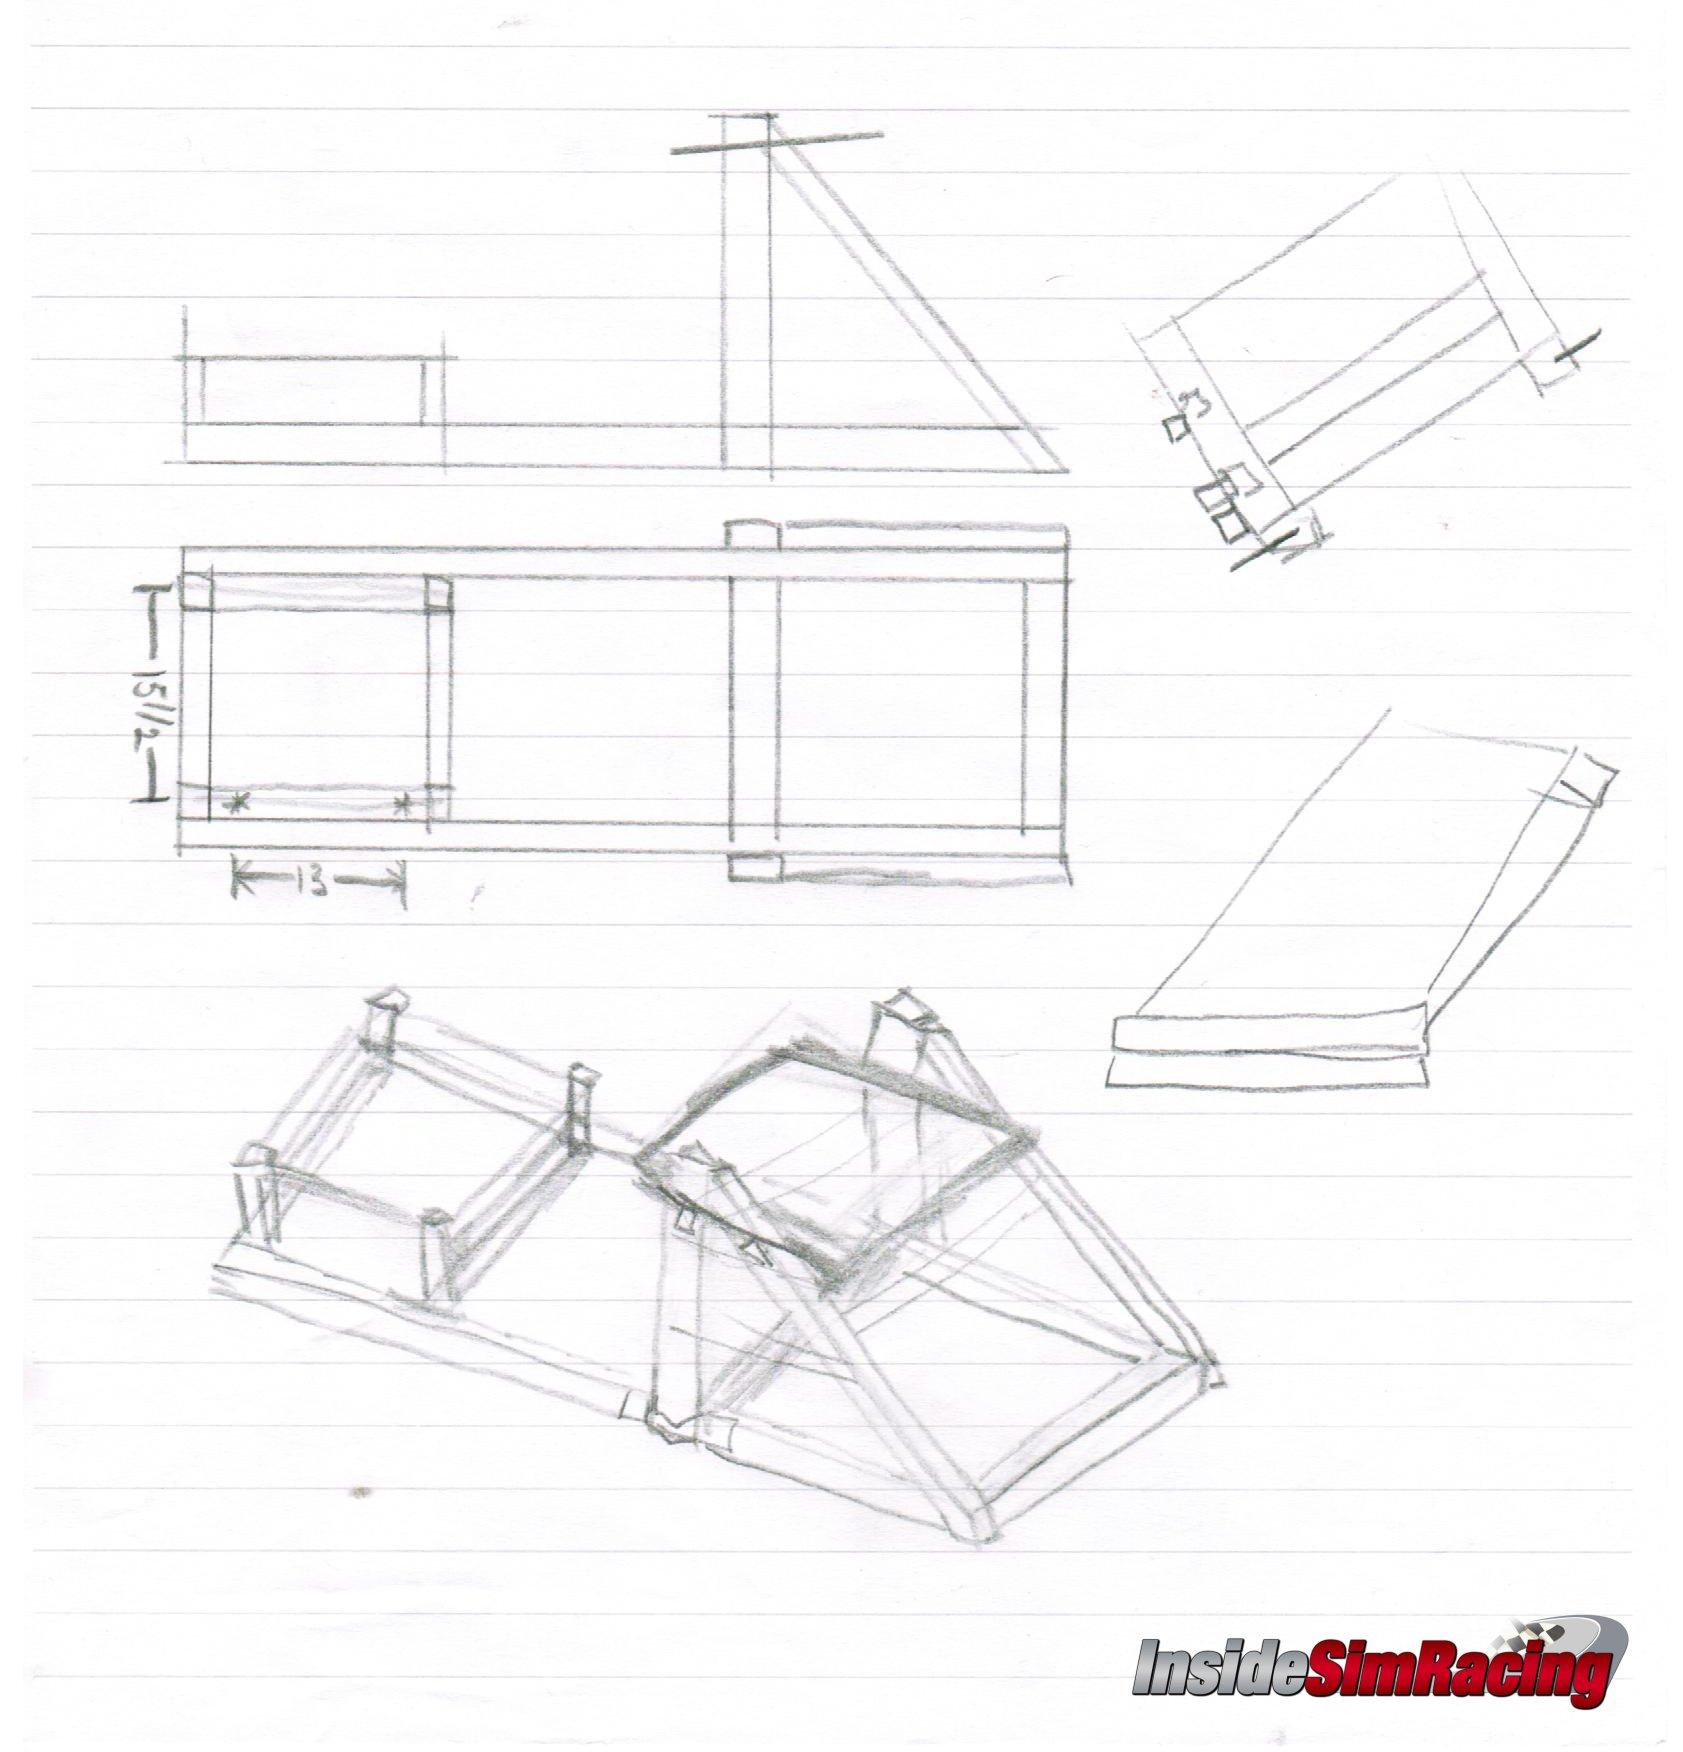 racing simulator chair plans desk and diy pvc sim rig do it your self